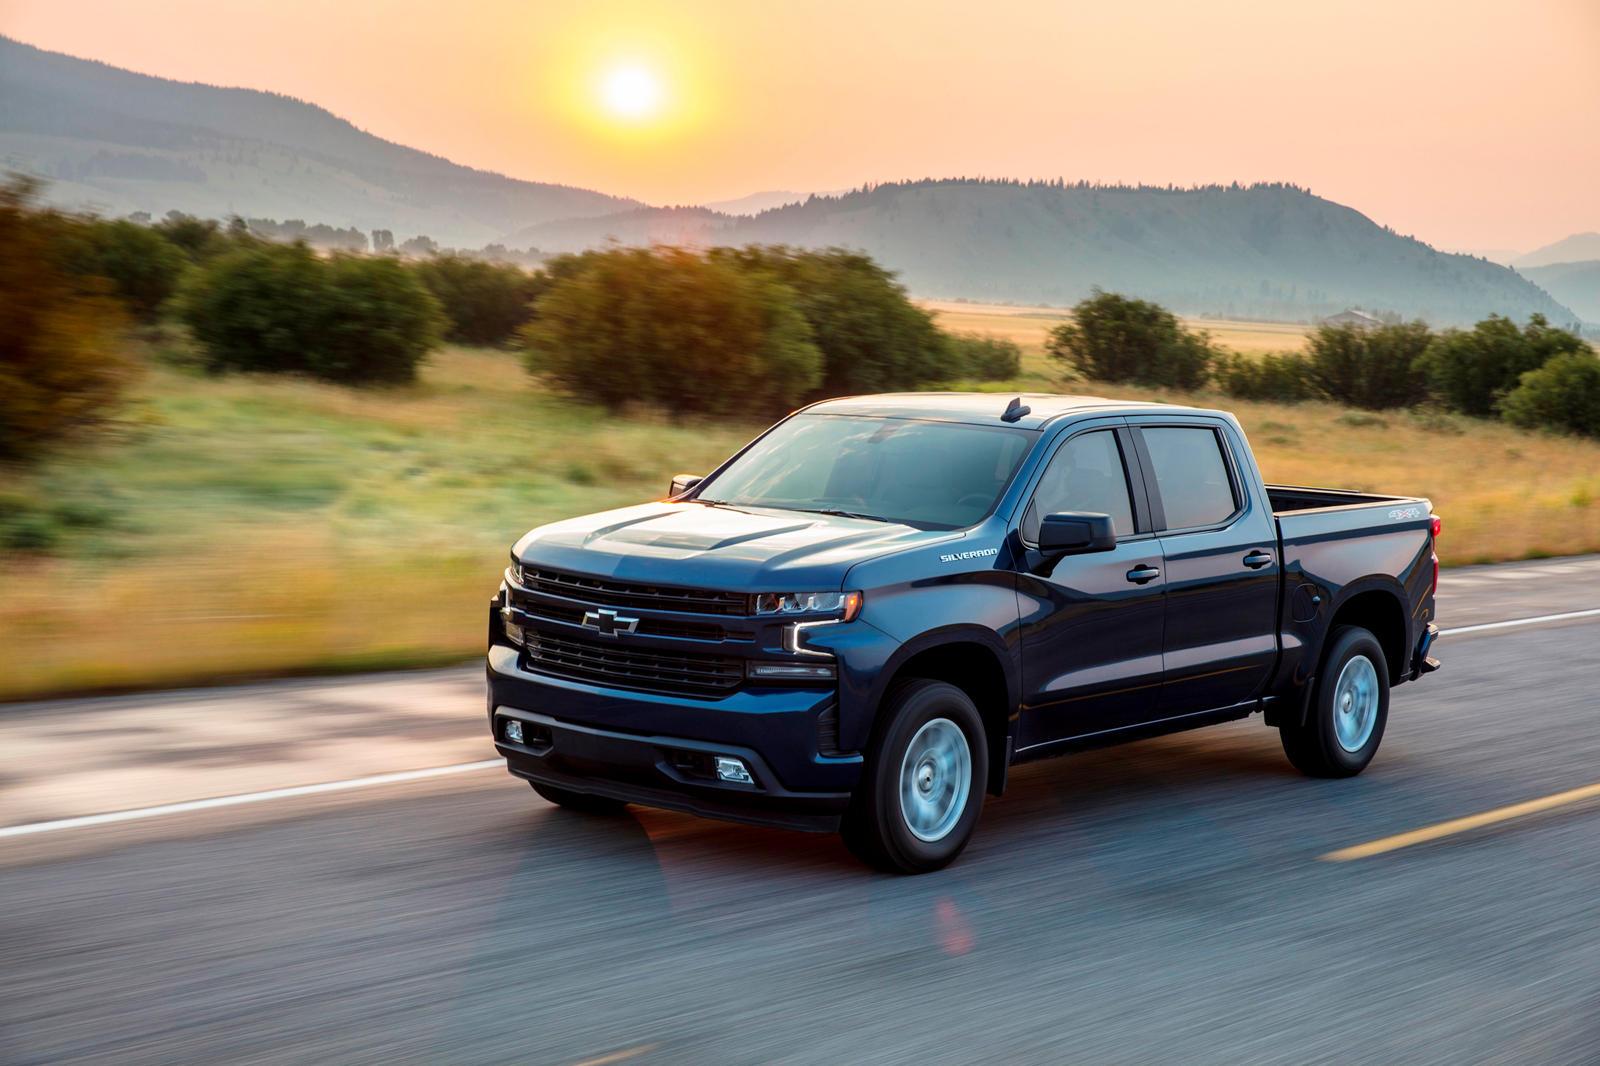 2020 Chevrolet Silverado 1500 Review, Trims, Specs and Price | CarBuzz